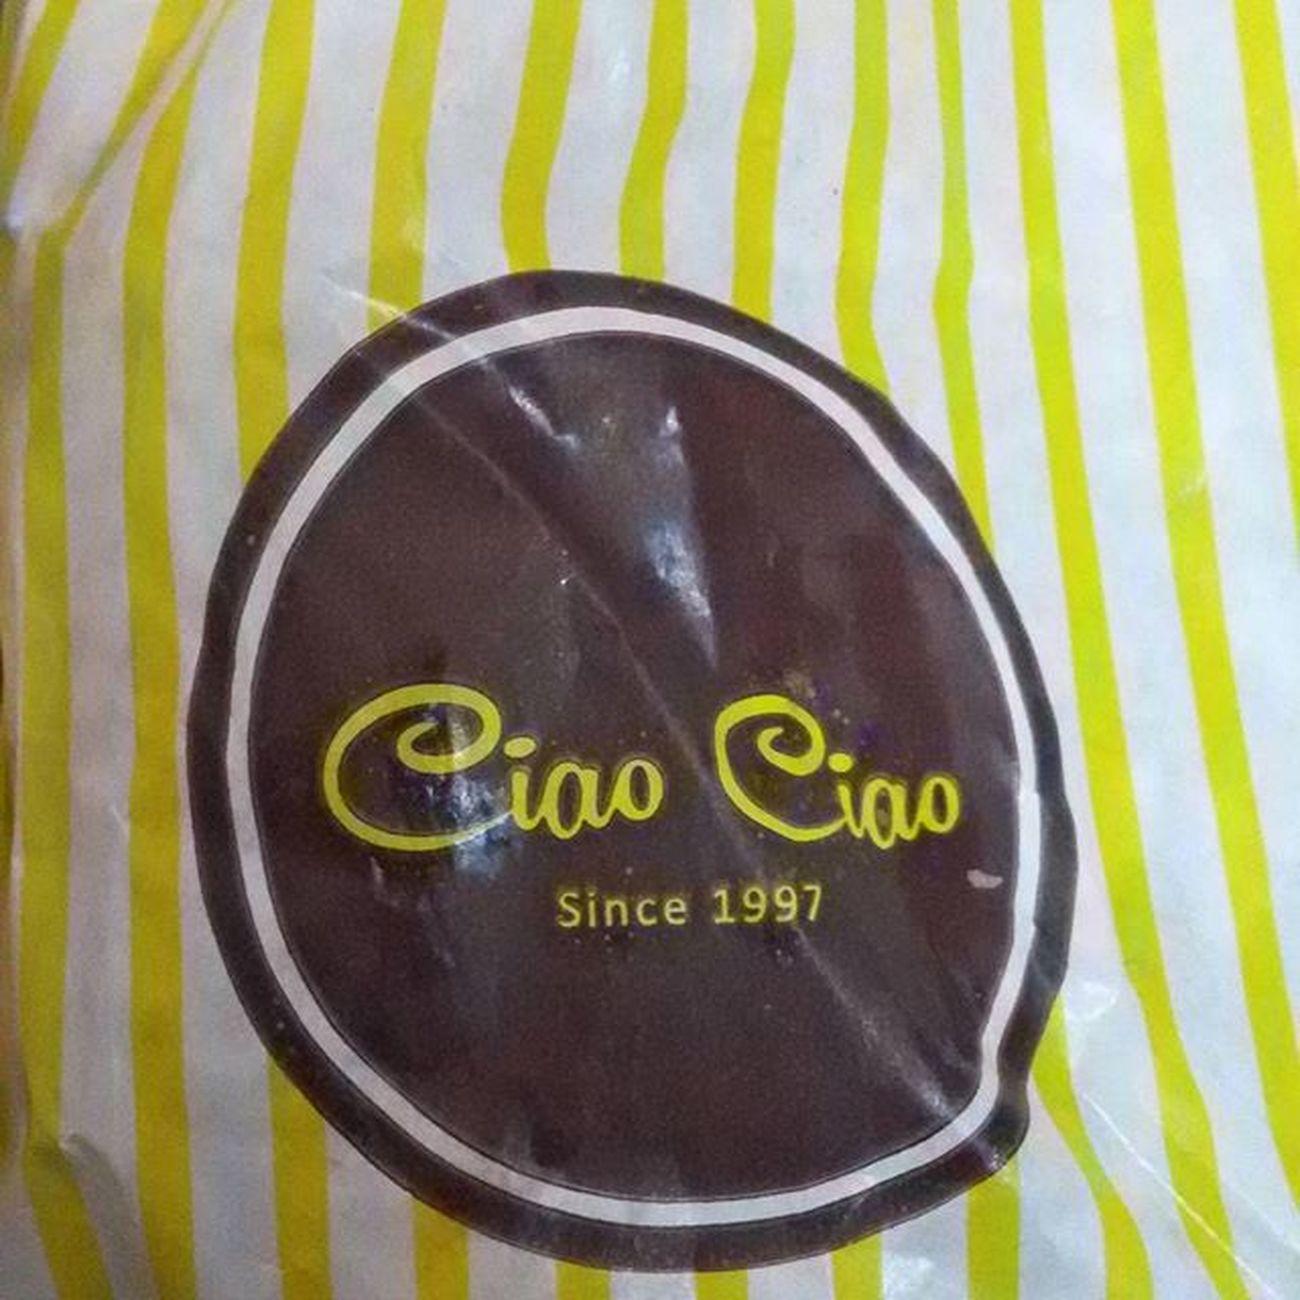 Ciao Ciao Sfax2021💜 Sfe9issna Elghalia Croissant 1000 % sfe9siHappppy Love